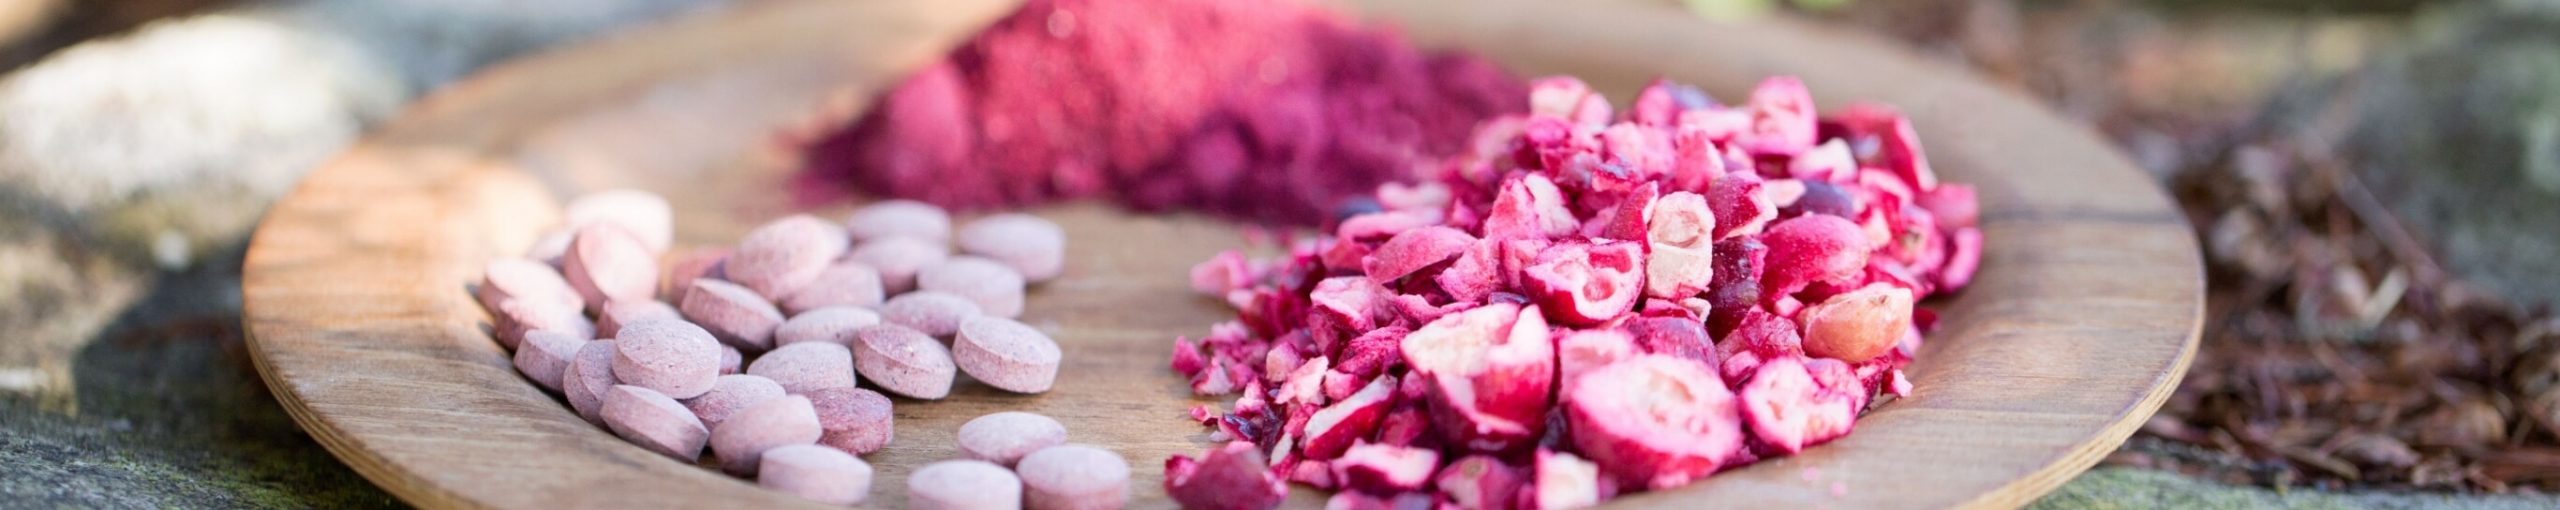 organic vitamins and minerals supplements